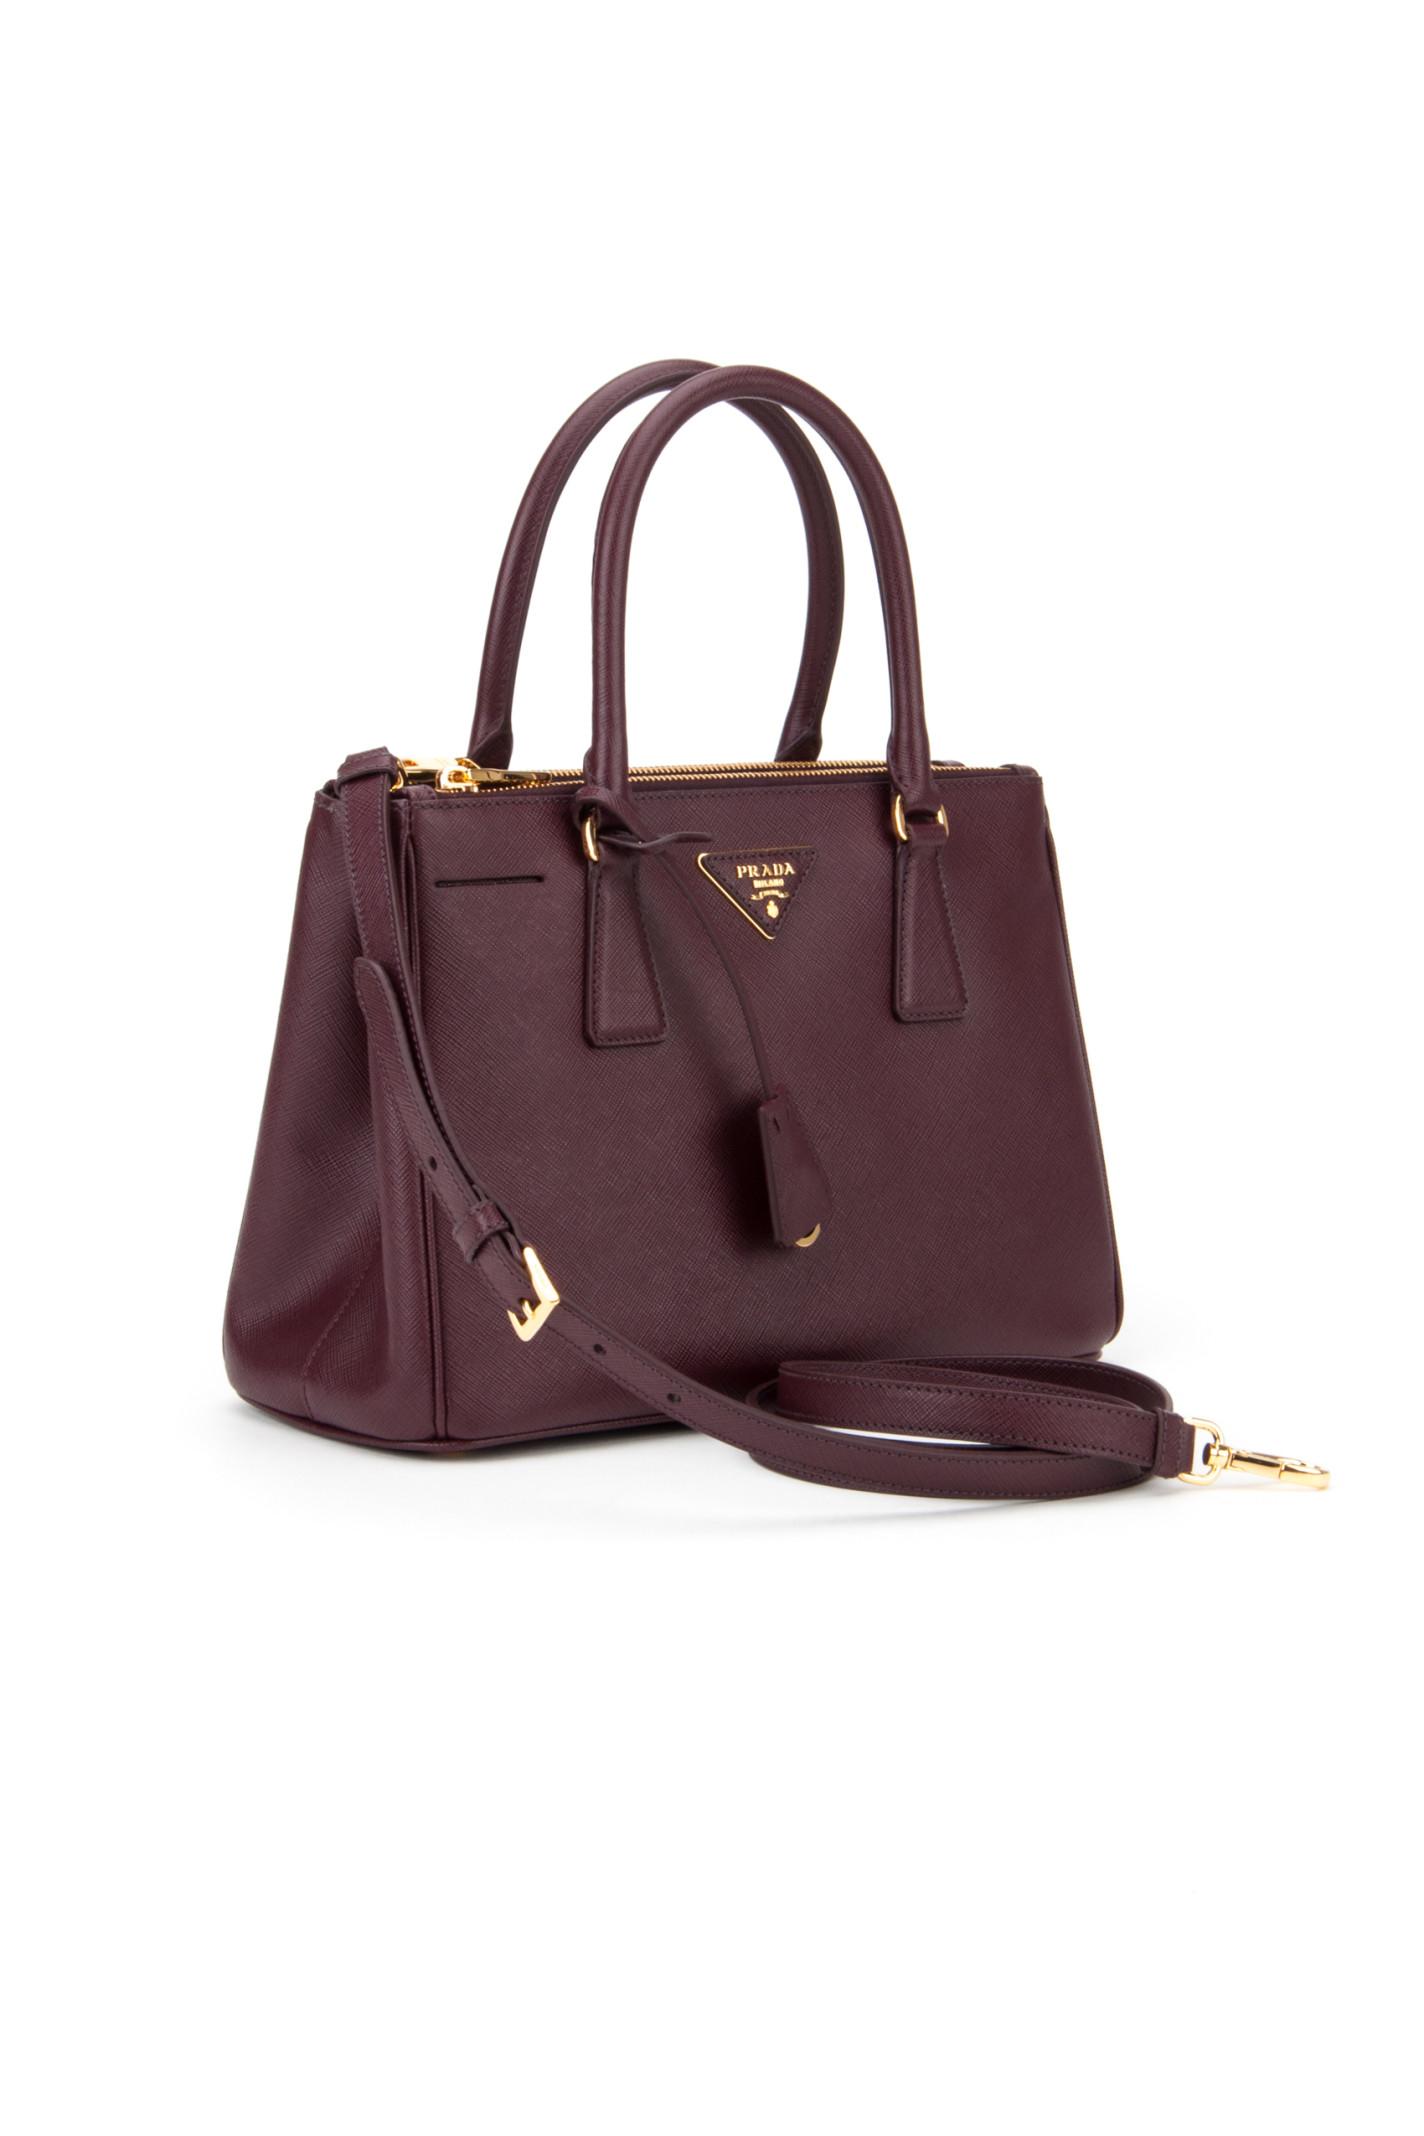 prada leather women bag